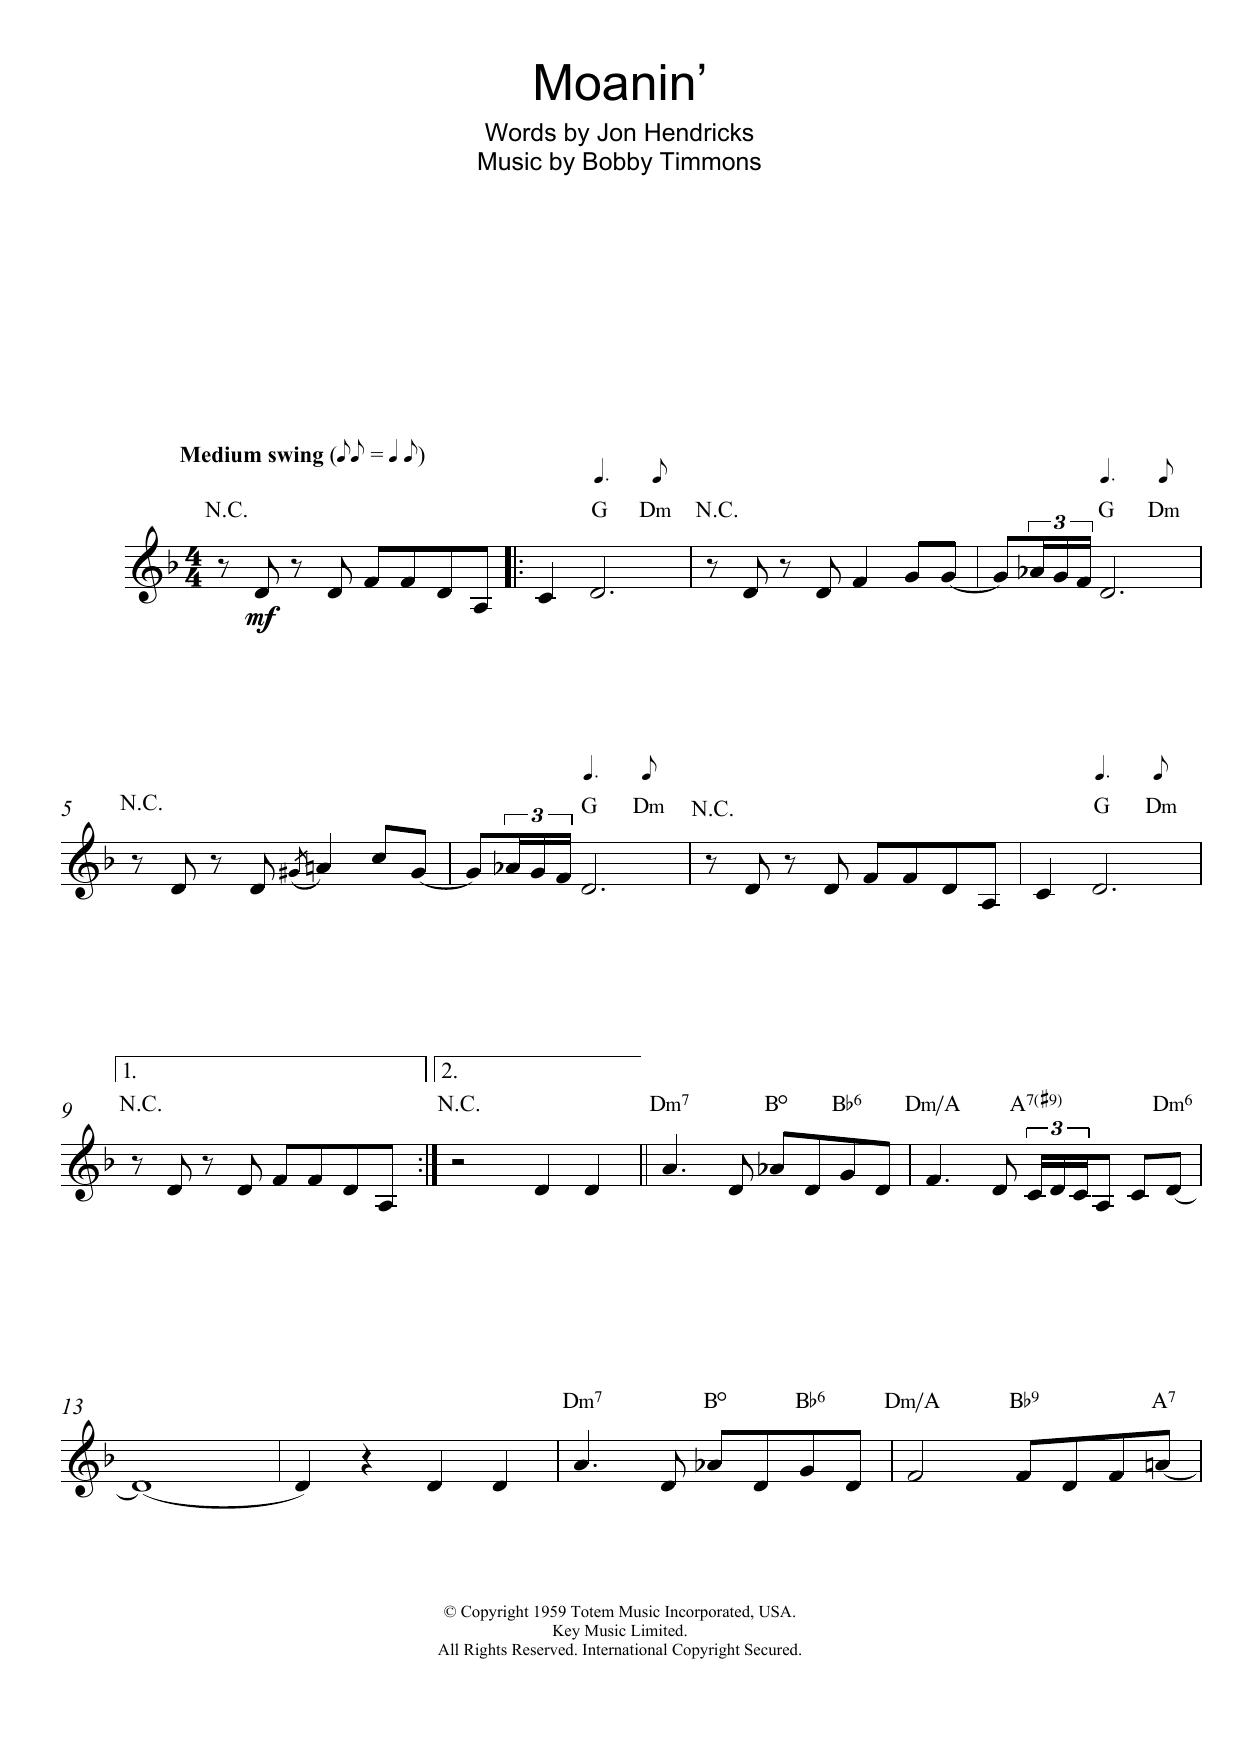 Sheet Music Digital Files To Print - Licensed Jon Hendricks